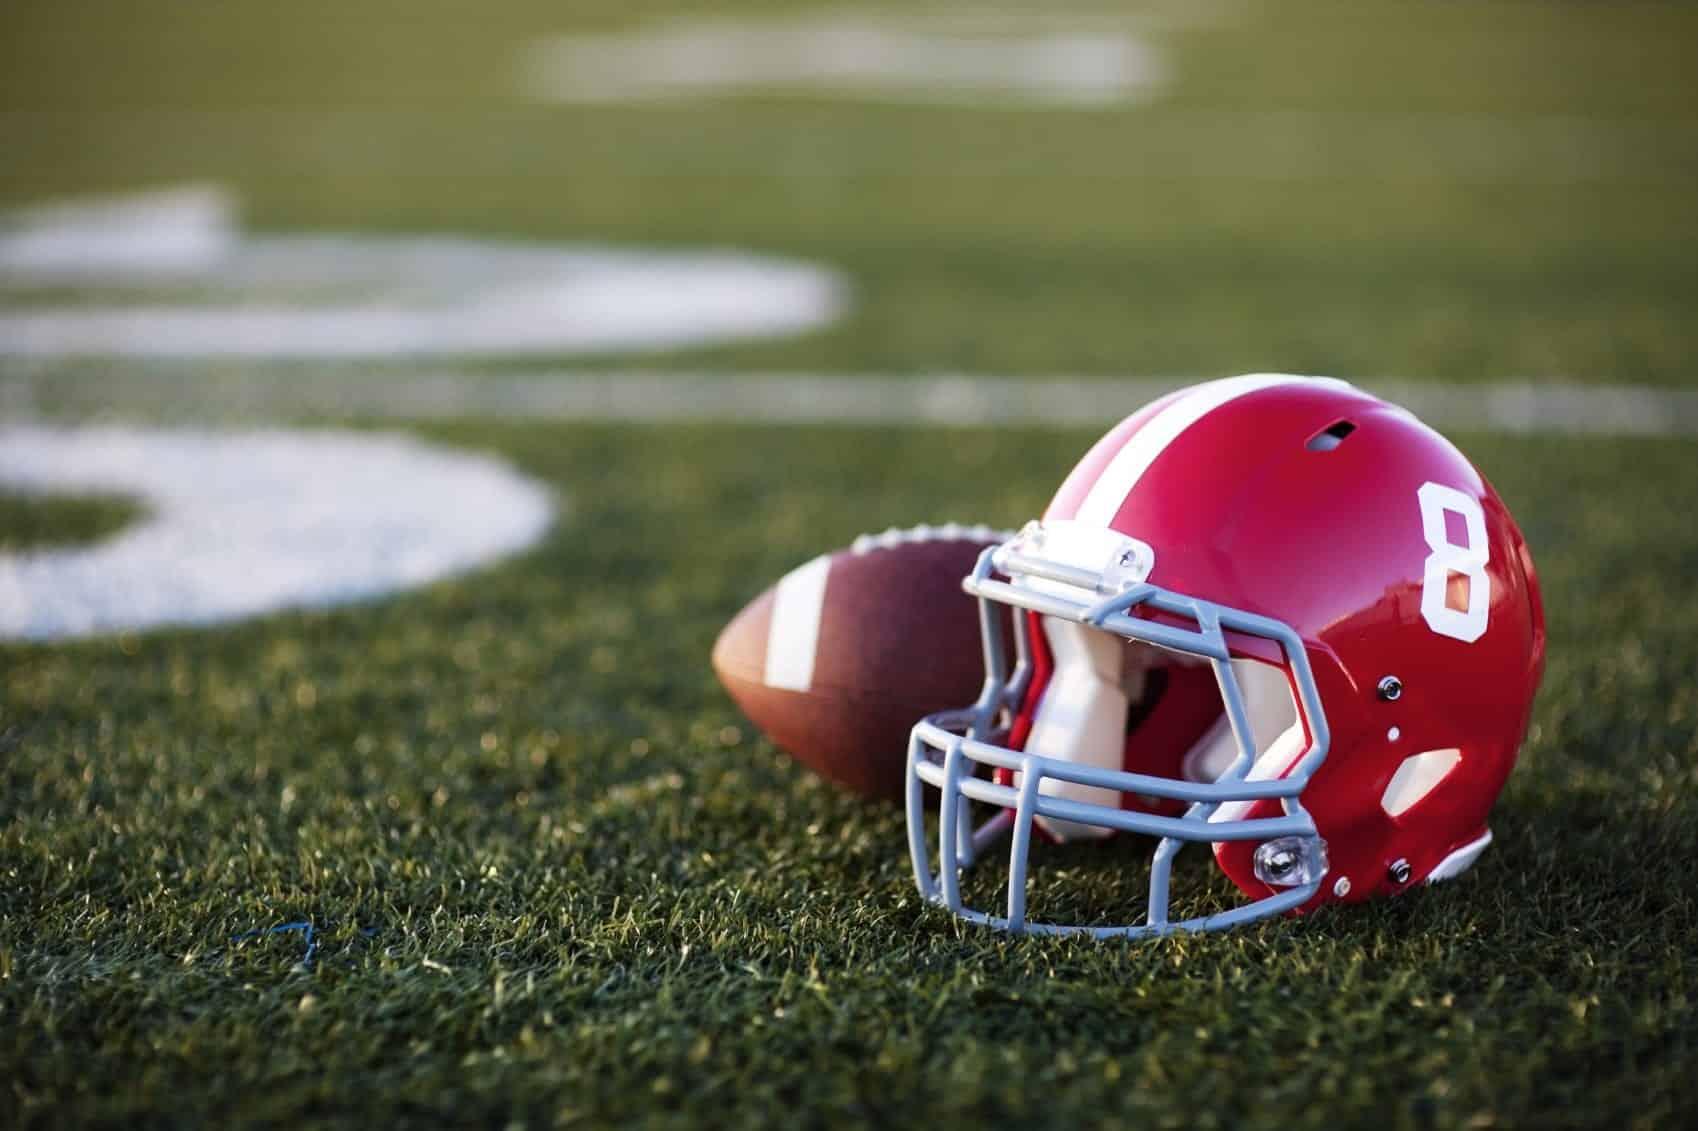 Football Helmet Laying Next To A Football Stock Photo